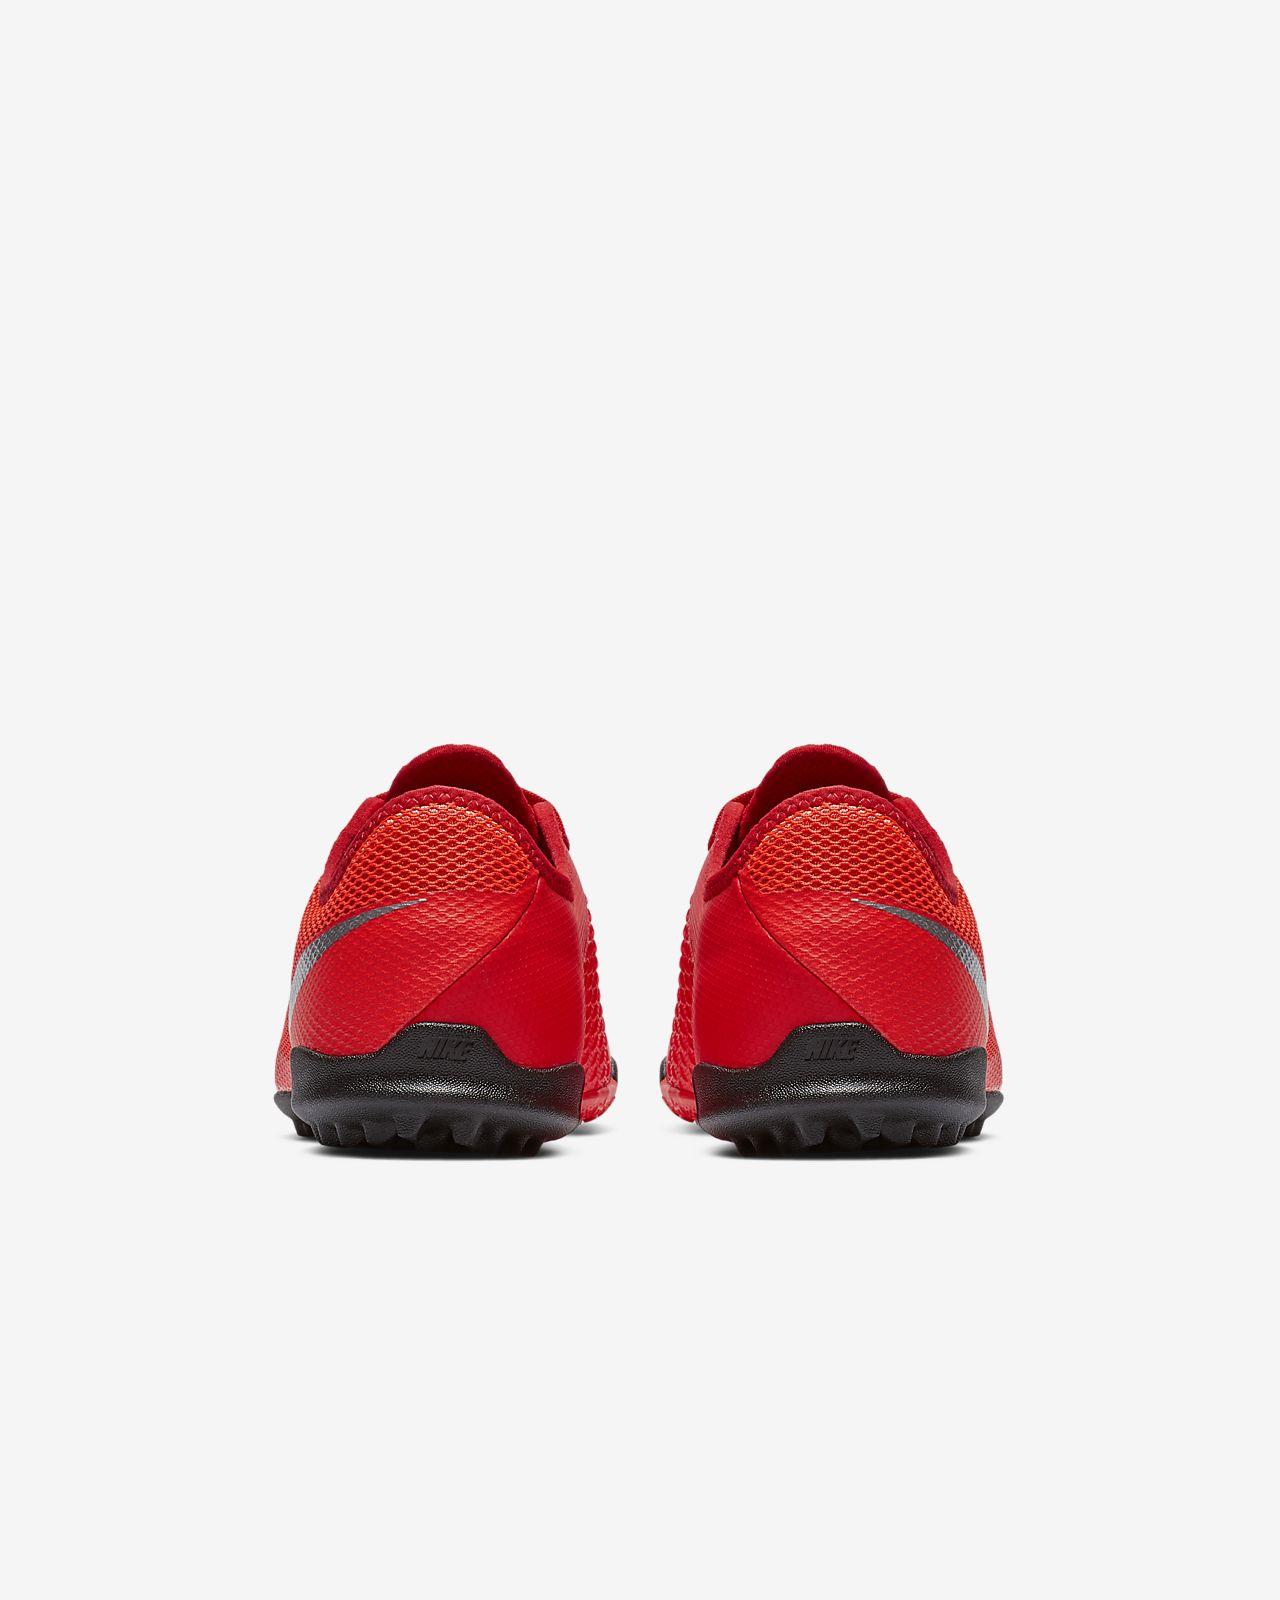 9f73ec06f3 Nike Jr. PhantomVSN Academy Game Over TF Younger/Older Kids' Turf Football  Shoe